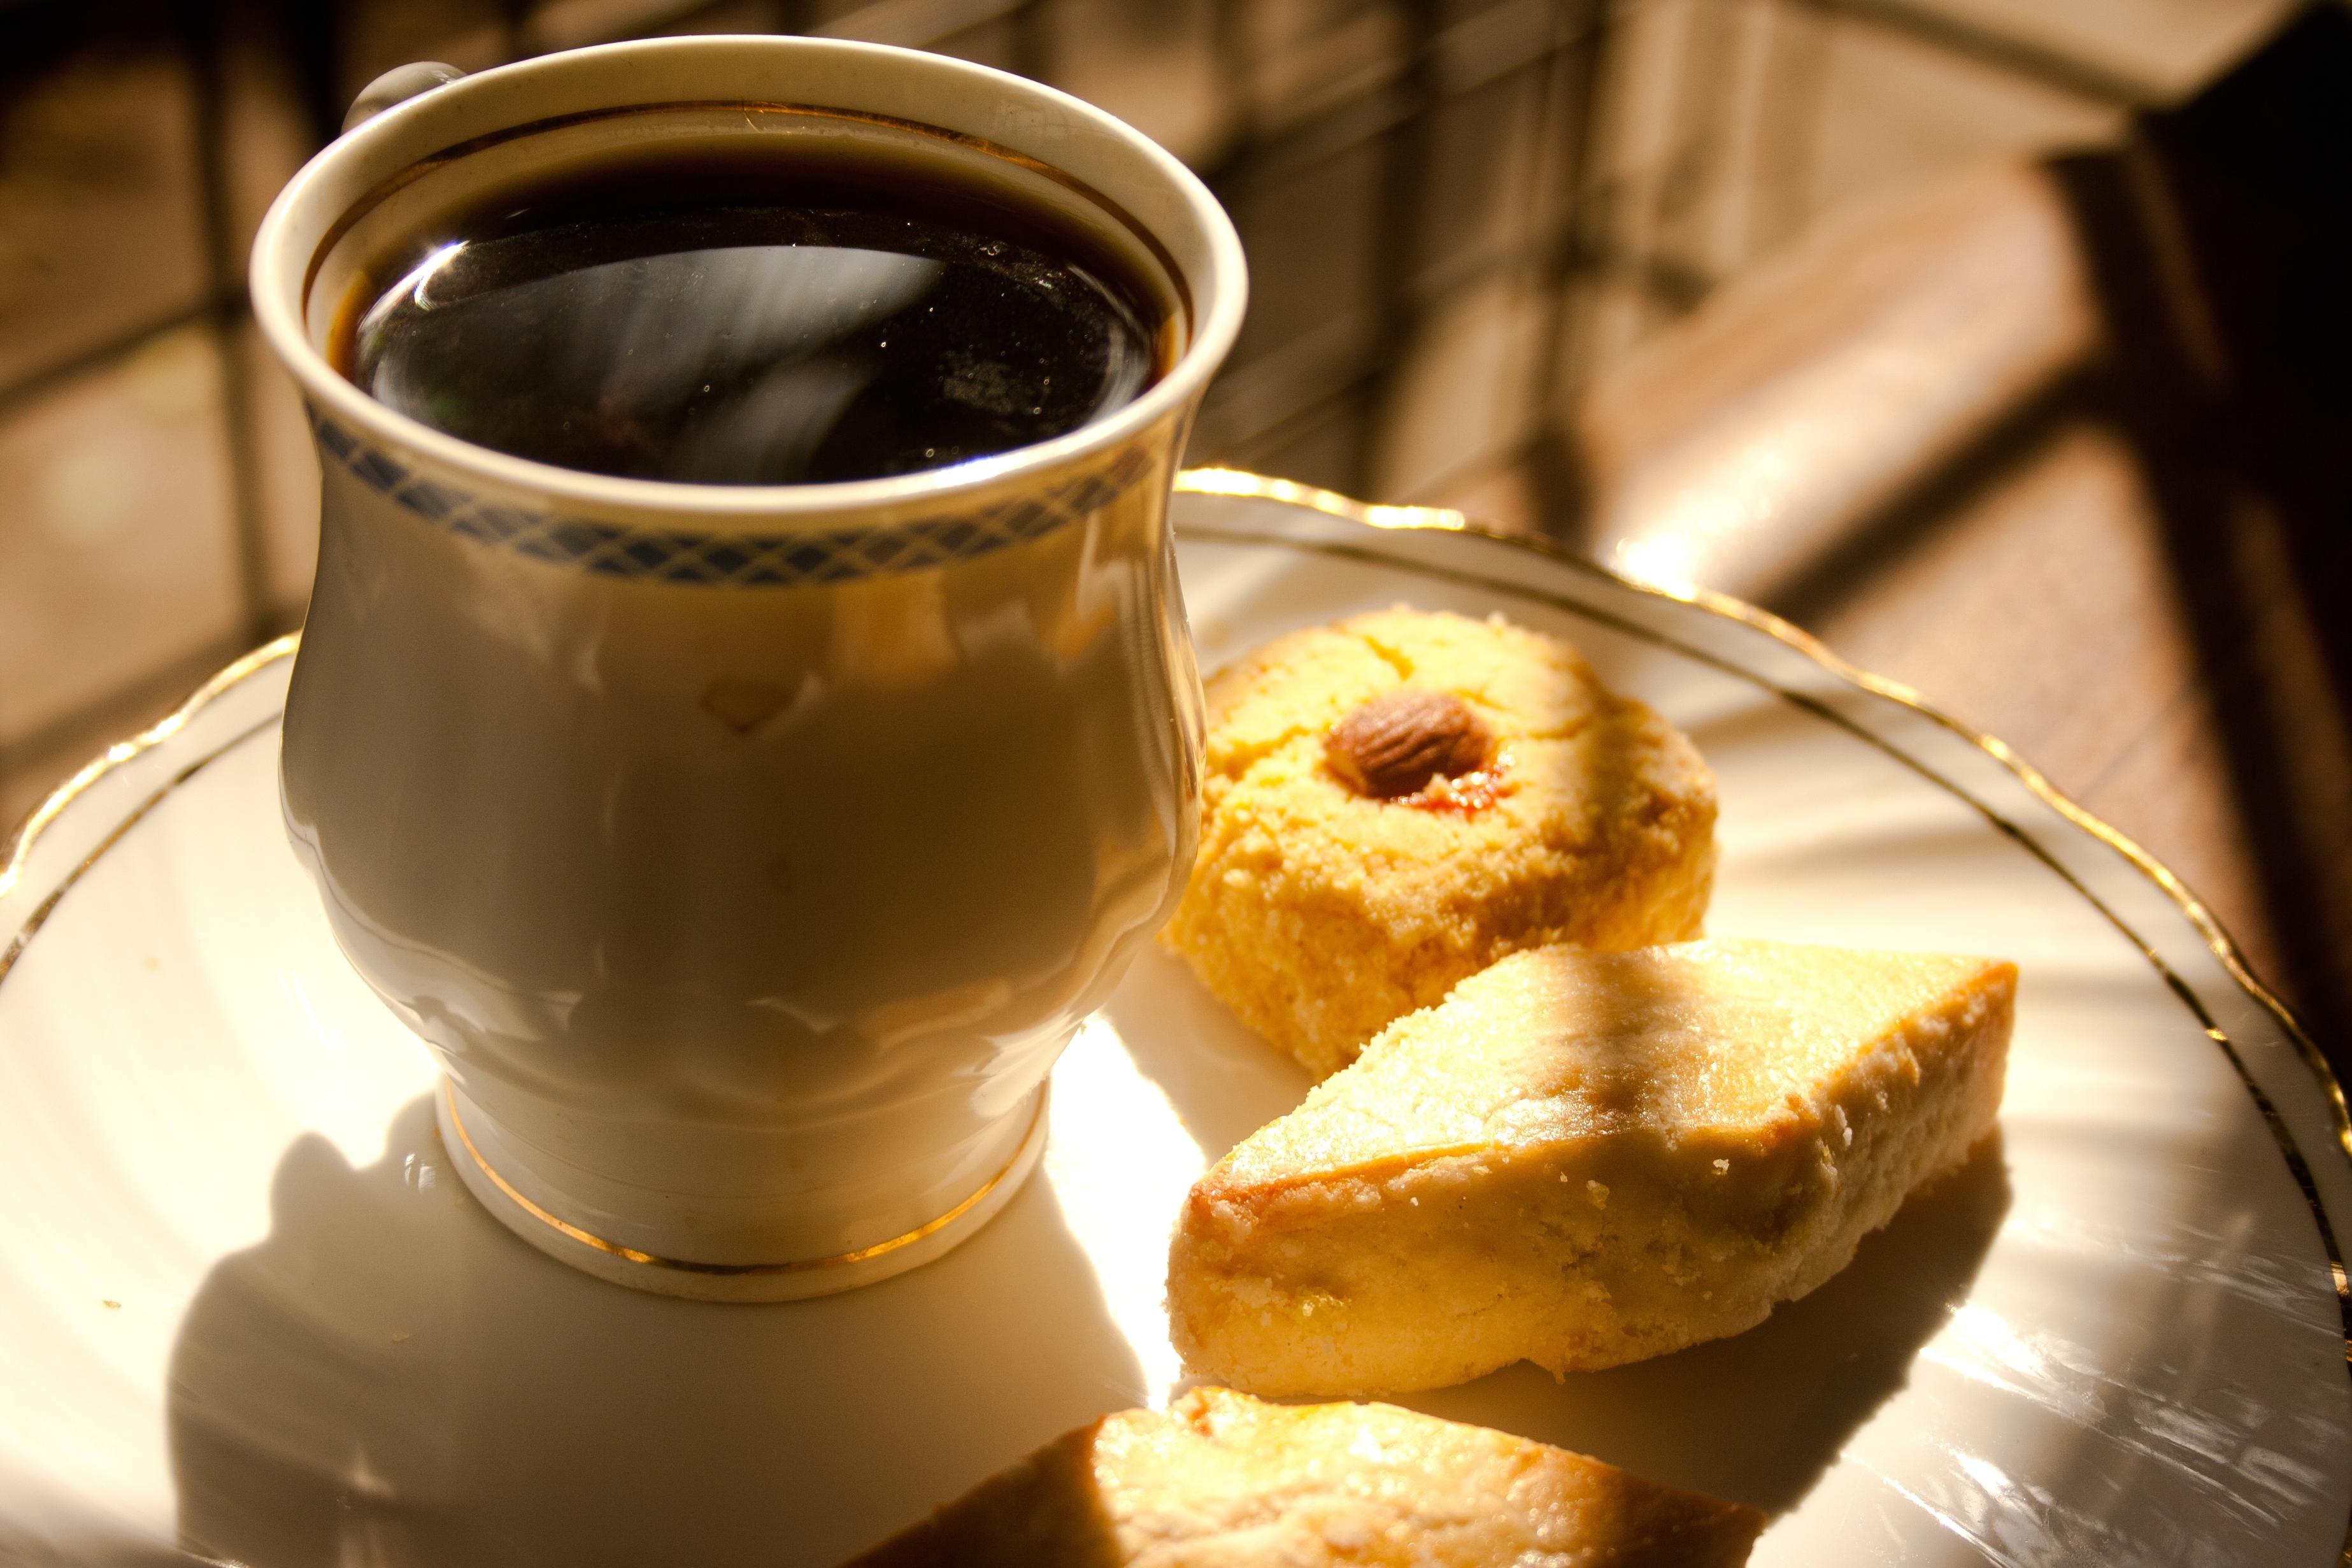 12/5: Visita guidata ai Caffè Storici e alle Piazze Auliche di Torino